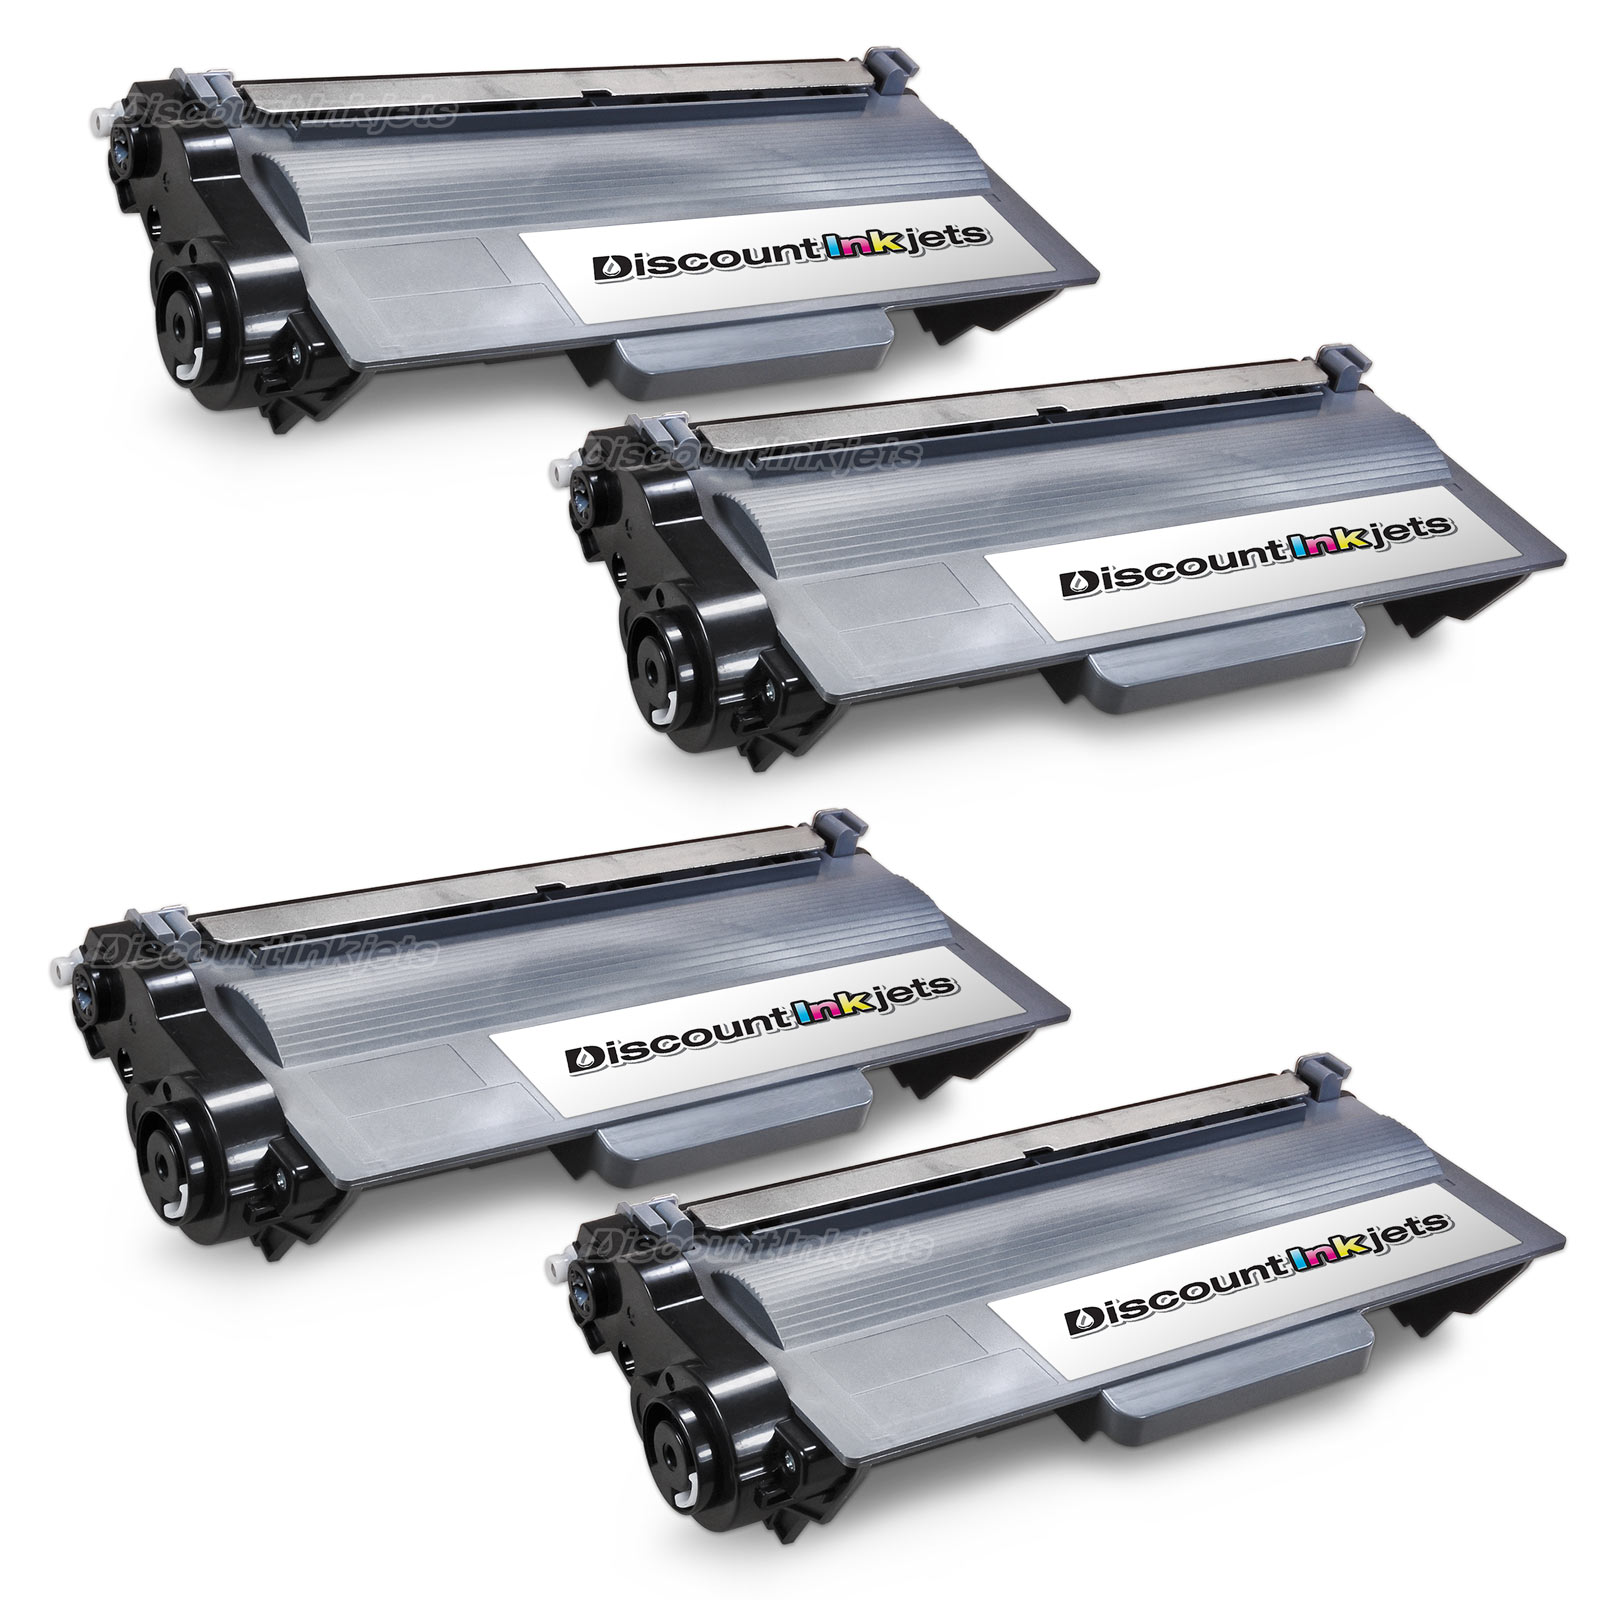 10 TN720 TN-720 BLACK Printer Toner Cartridge for Brother HL-5470DW HL-5470DWT